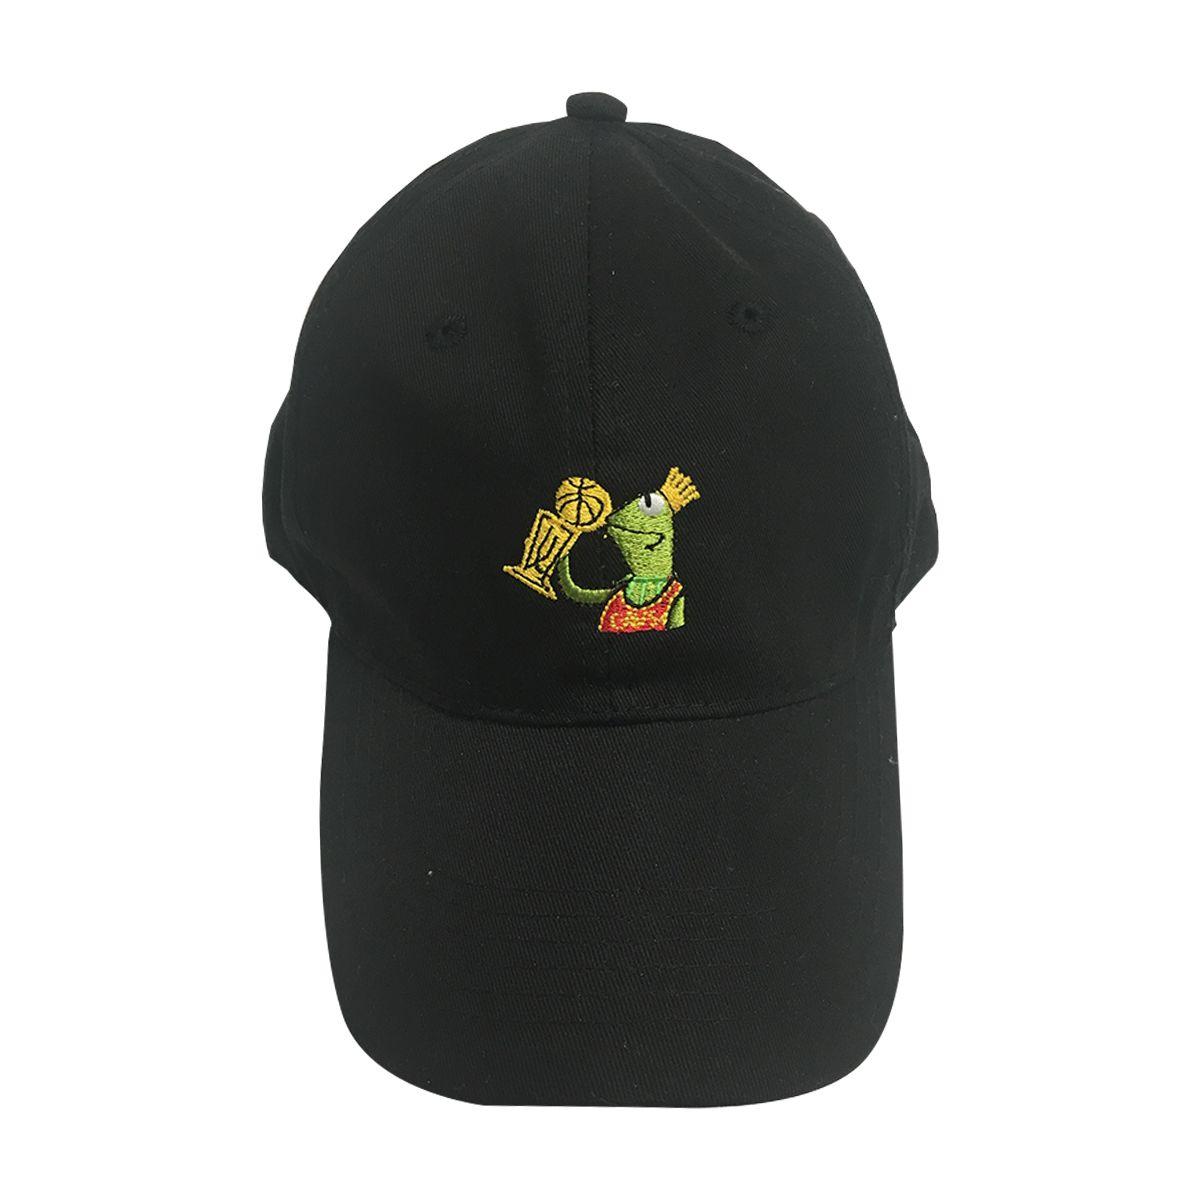 Kermit Kissing Trophy But That's None Of My Business Black Hat Lebron James Cap